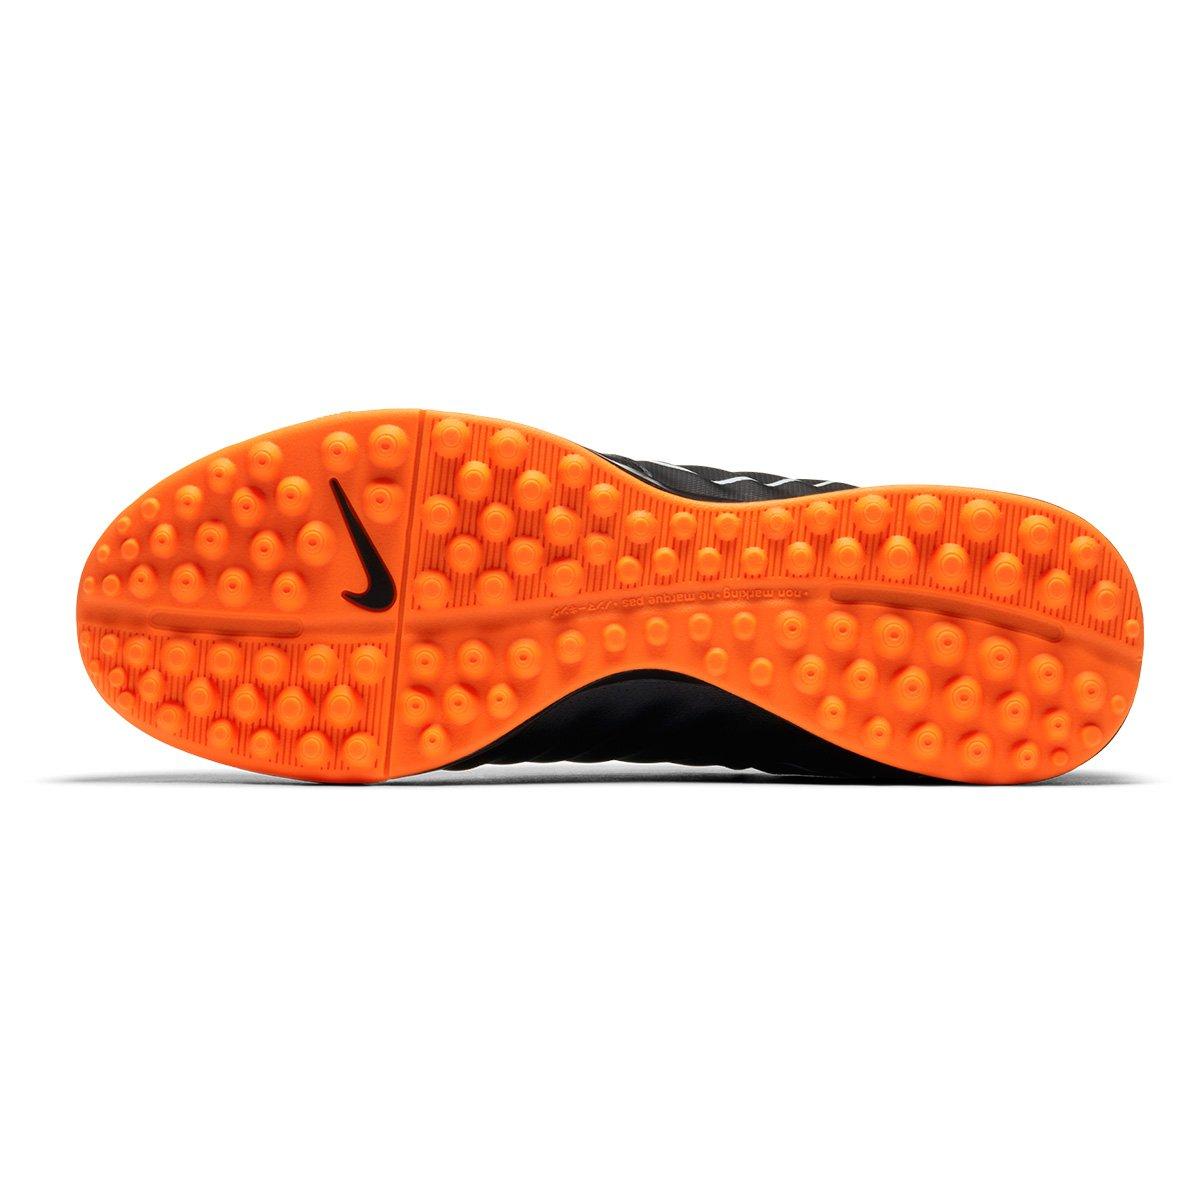 Chuteira Legend Nike Tiempo TF Academy e 7 Society Preto Masculina Laranja FrFwtqHB